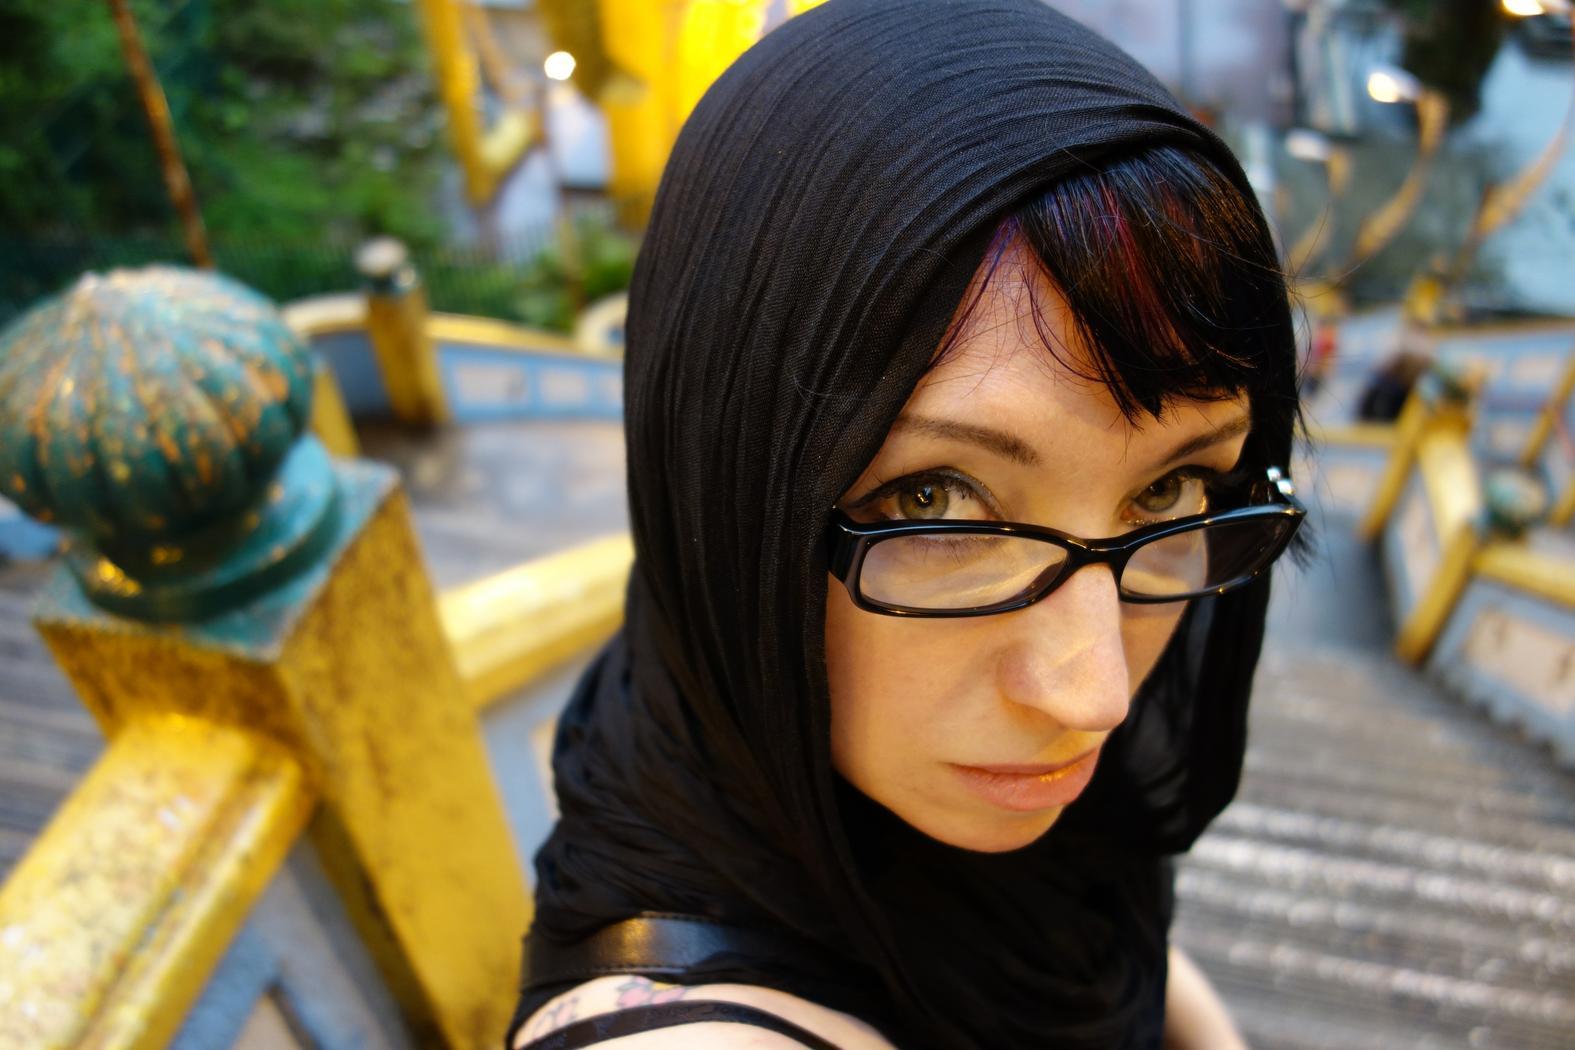 Violet Blue author journalist editor